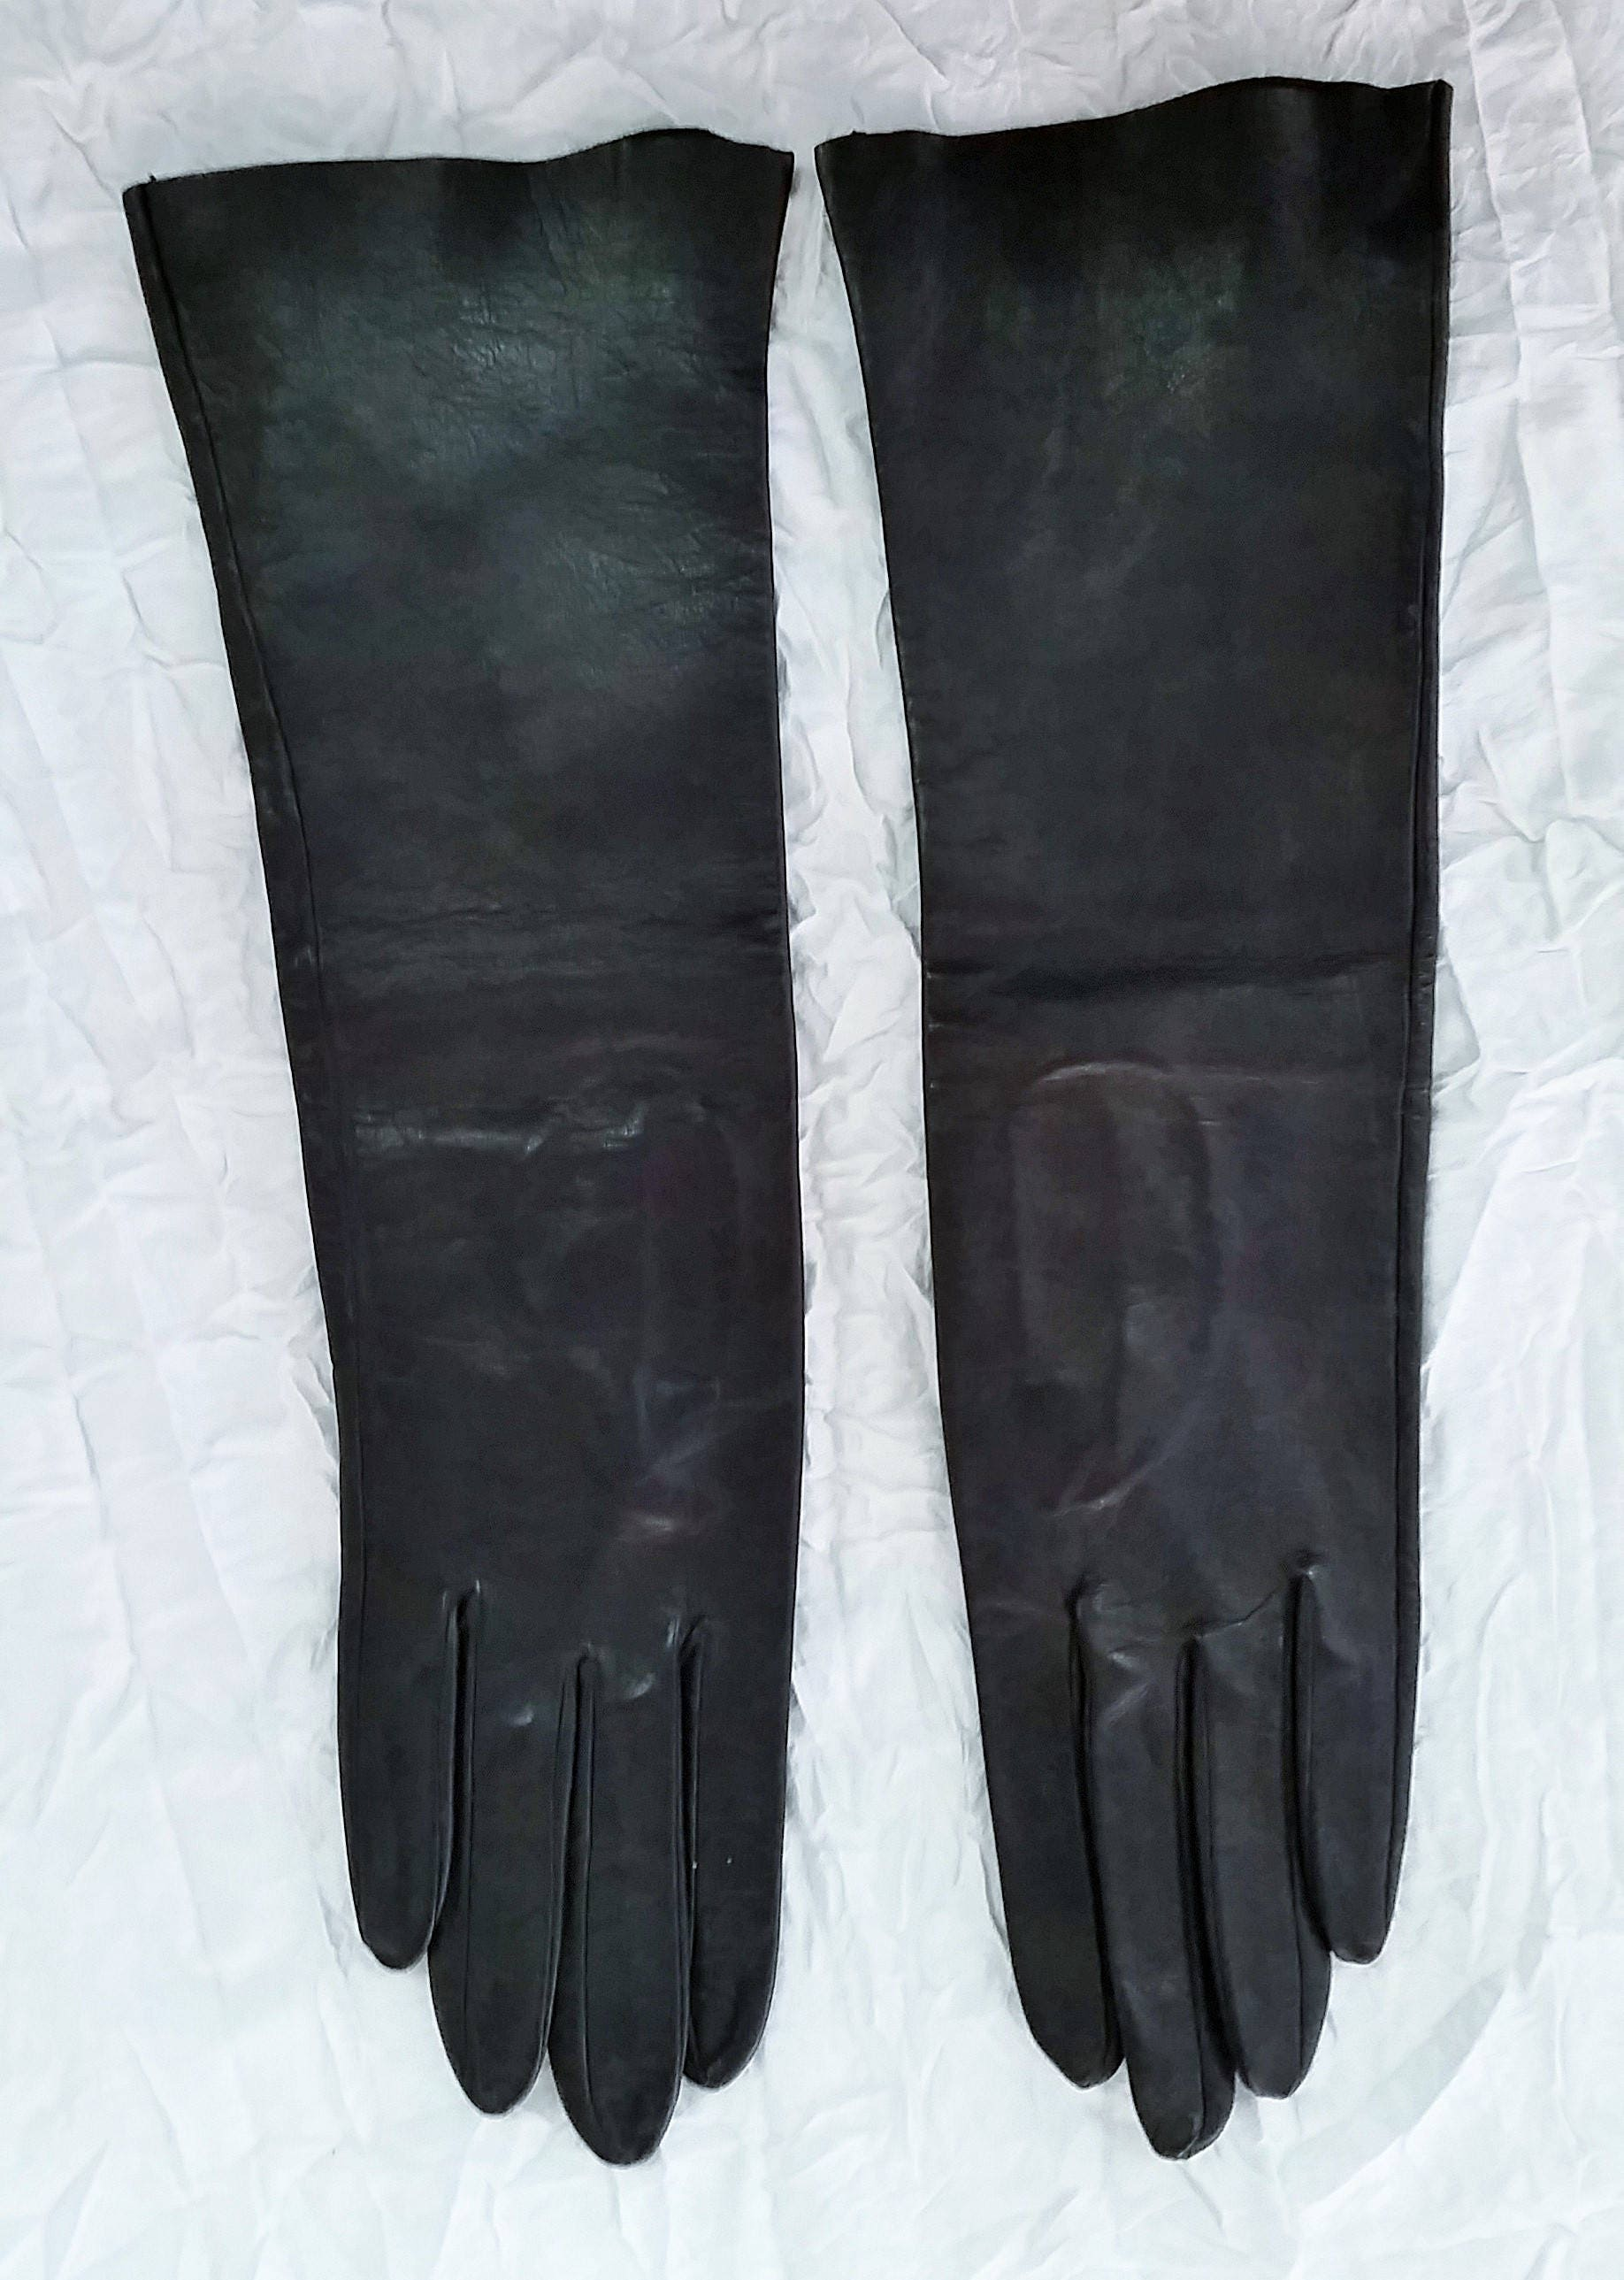 Vintage ladies leather opera gloves - Gallery Photo Gallery Photo Gallery Photo Gallery Photo Gallery Photo